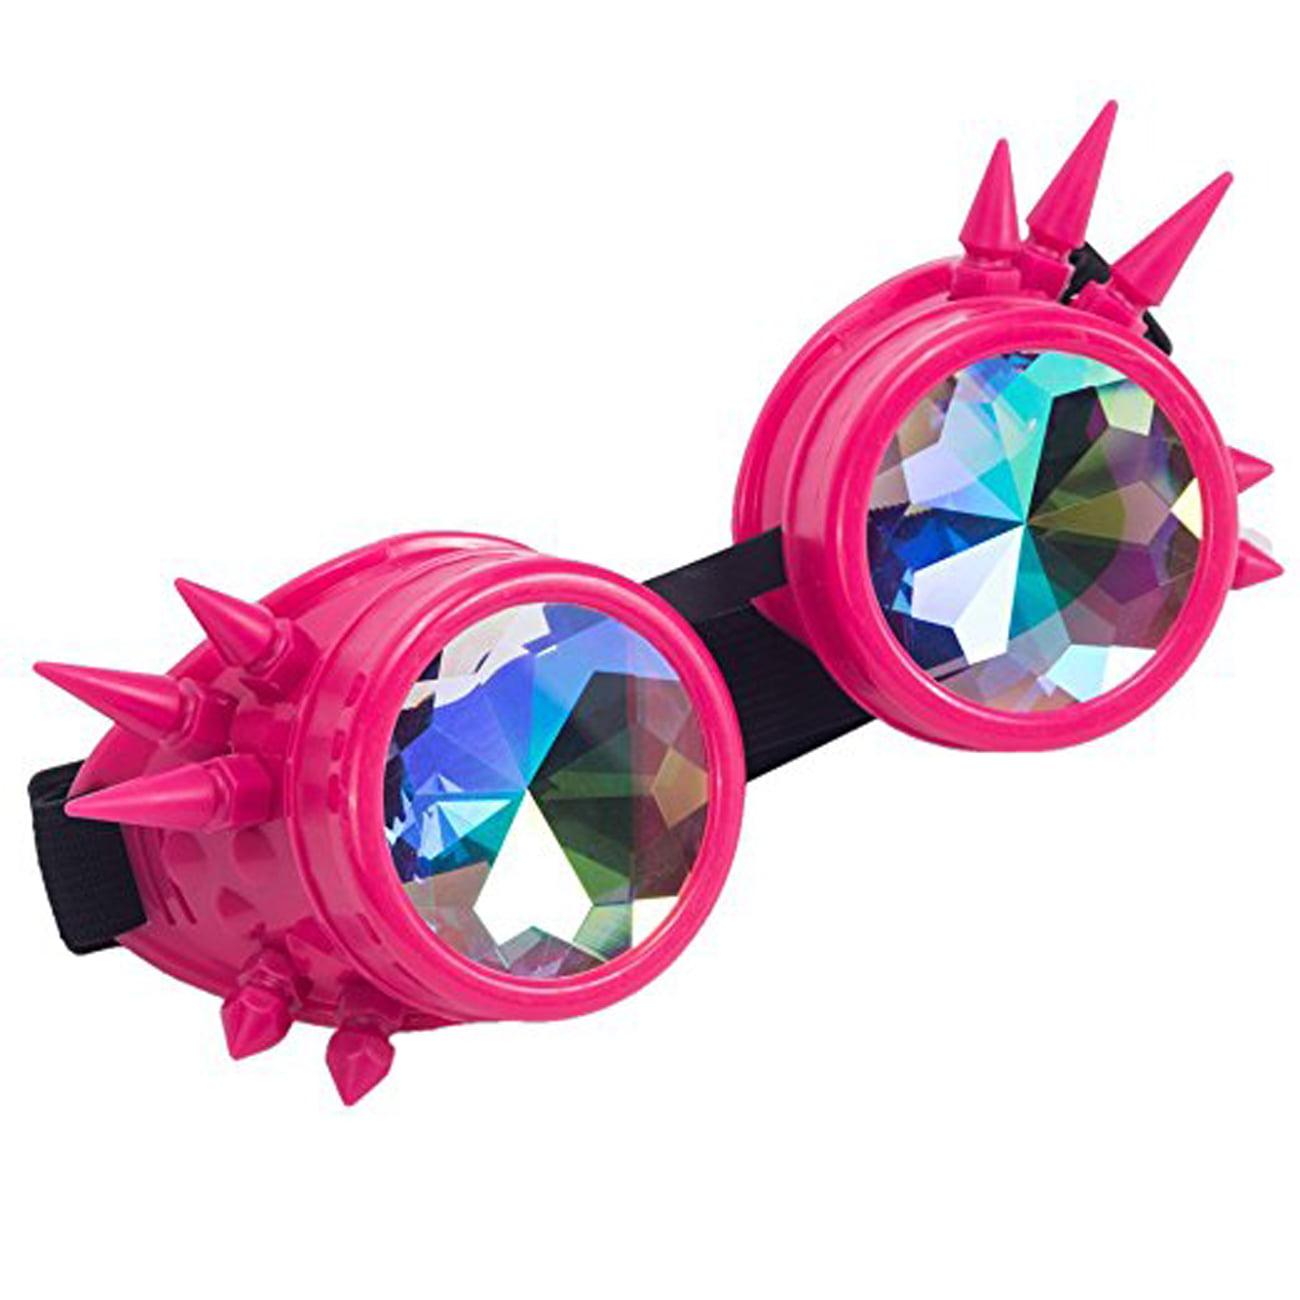 C.F.GOGGLE Vintage Rivet Diffraction Laser Goggles Welding Steampunk Glasses Rainbow Crystal Lens